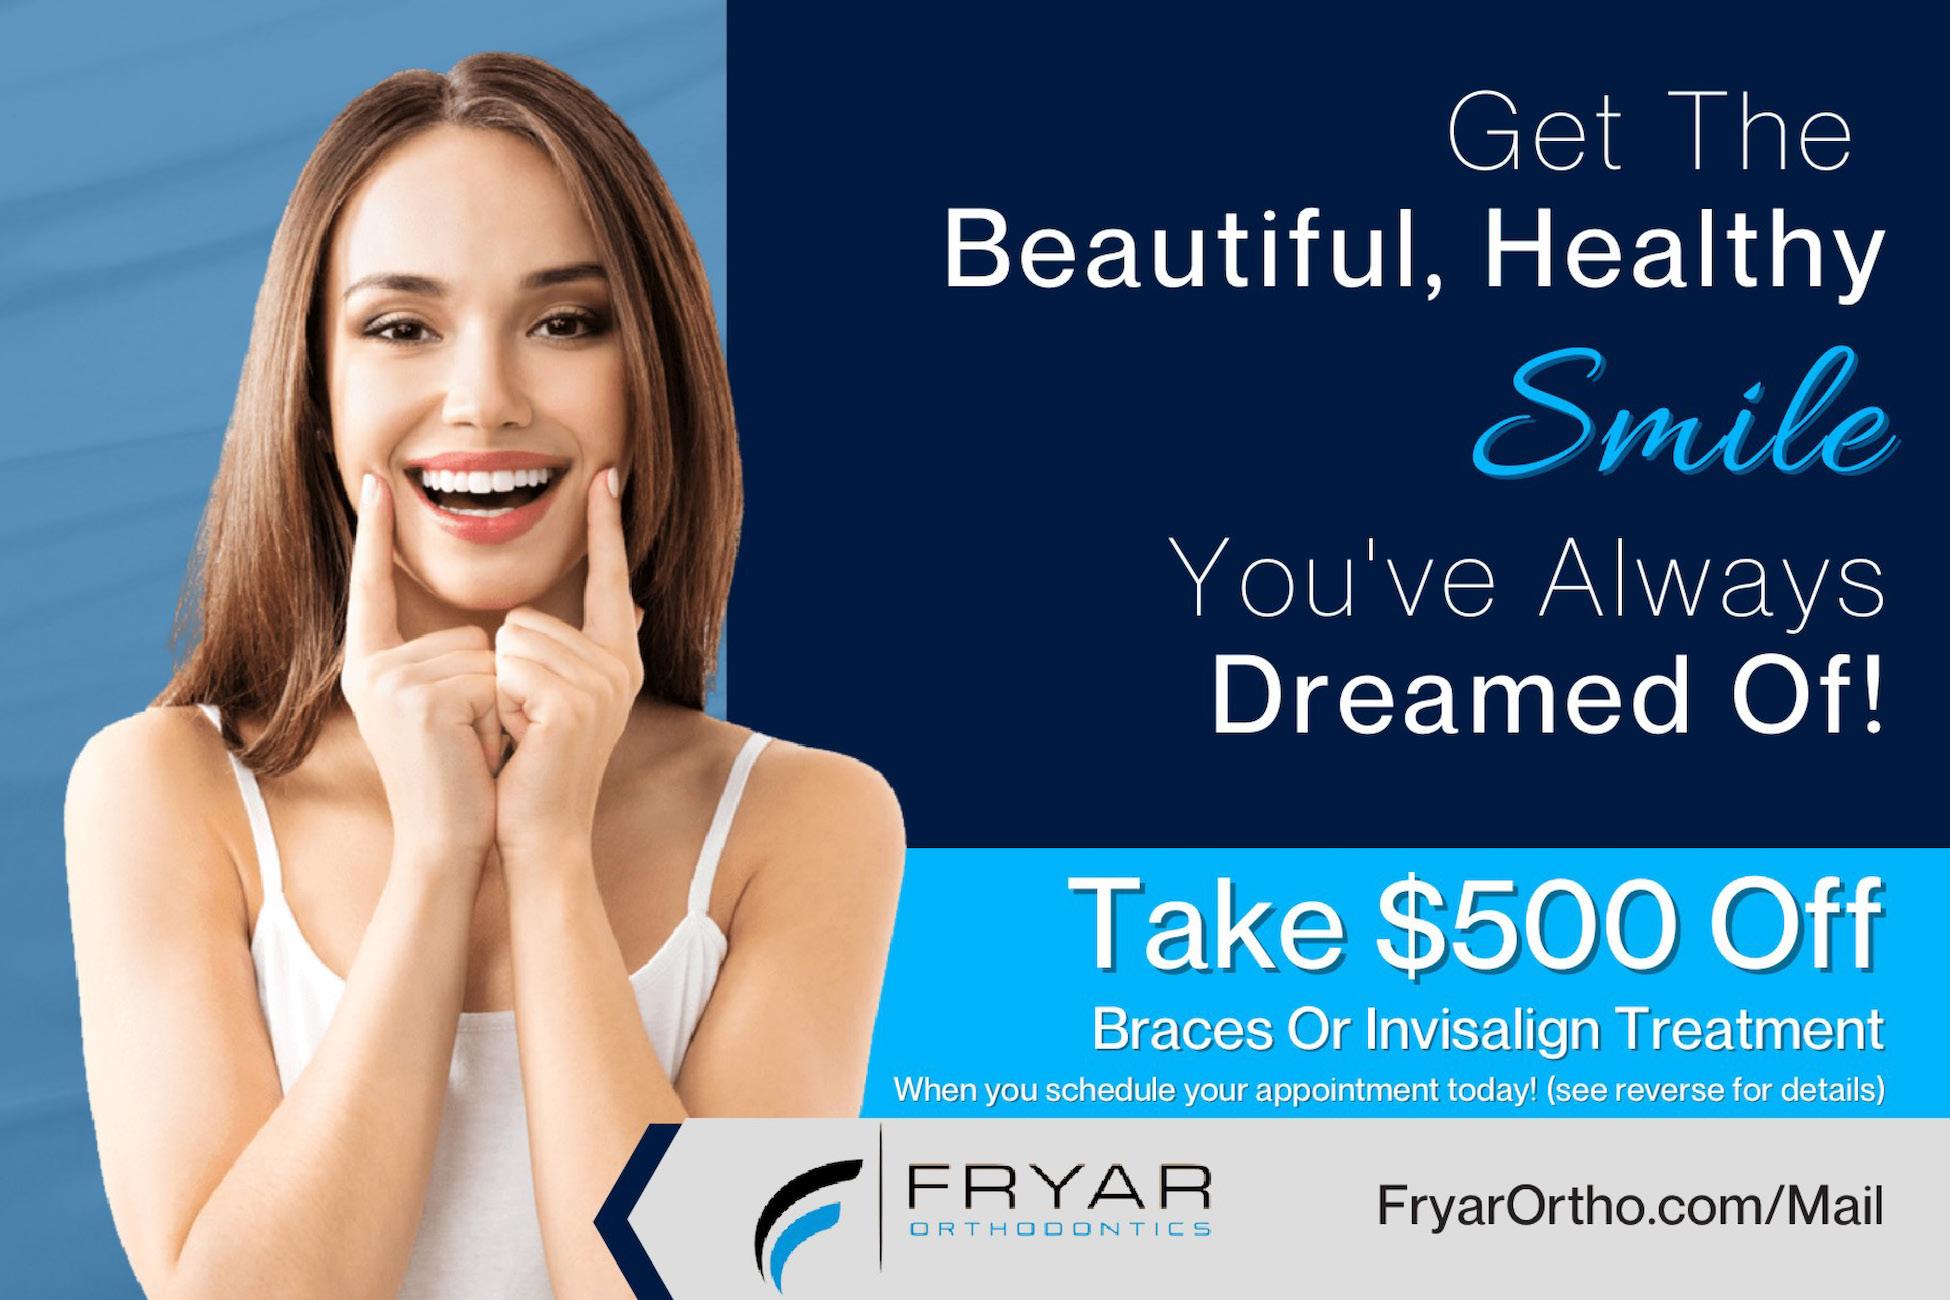 fryar orthodontics 500 off